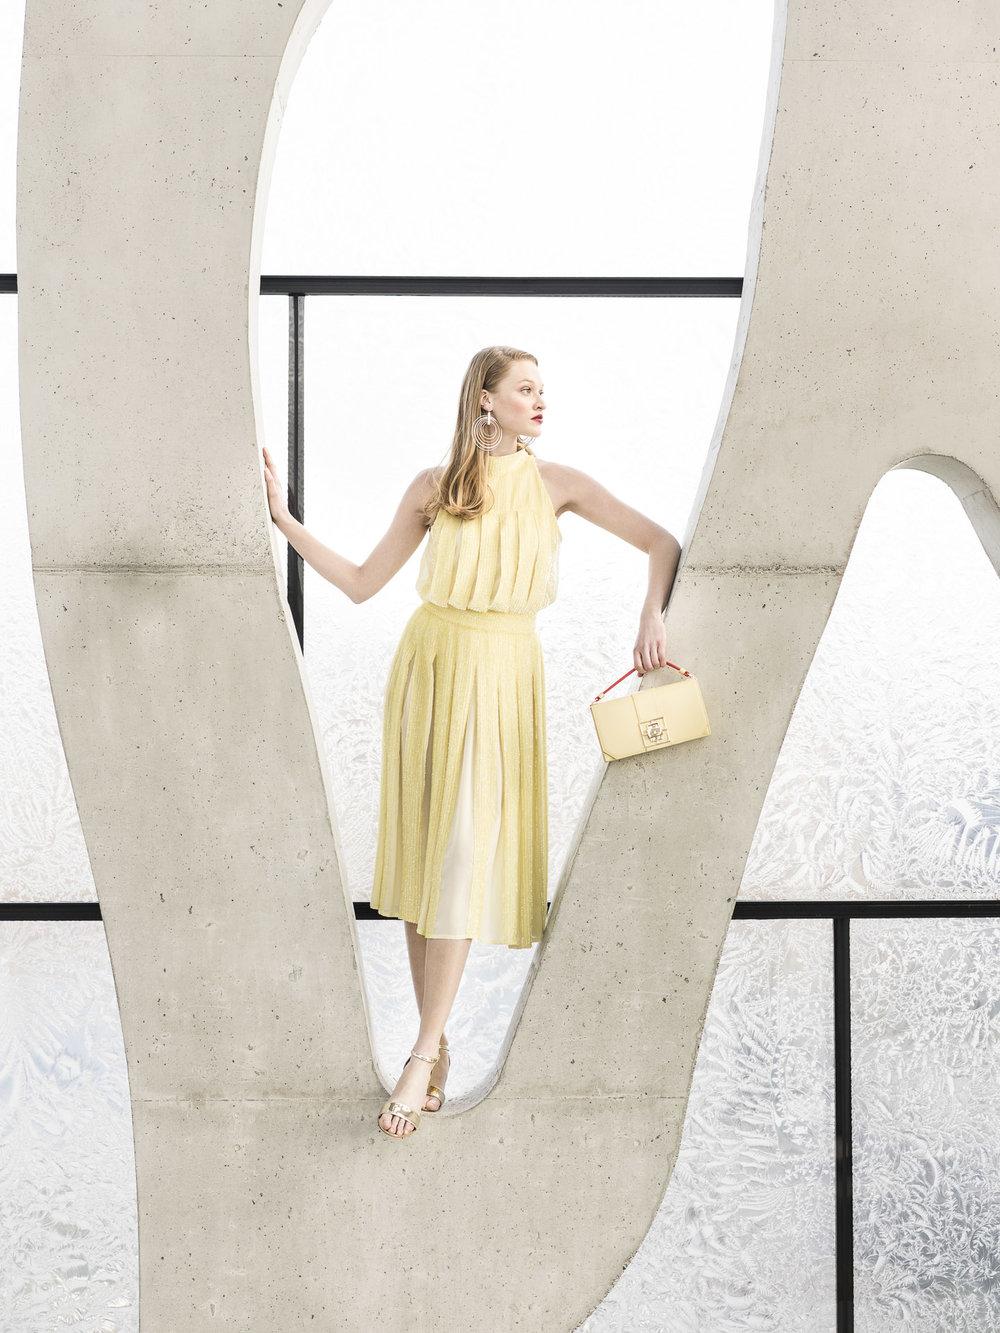 Fotowerk Lampelmayer - Sommerliche Modefotografie